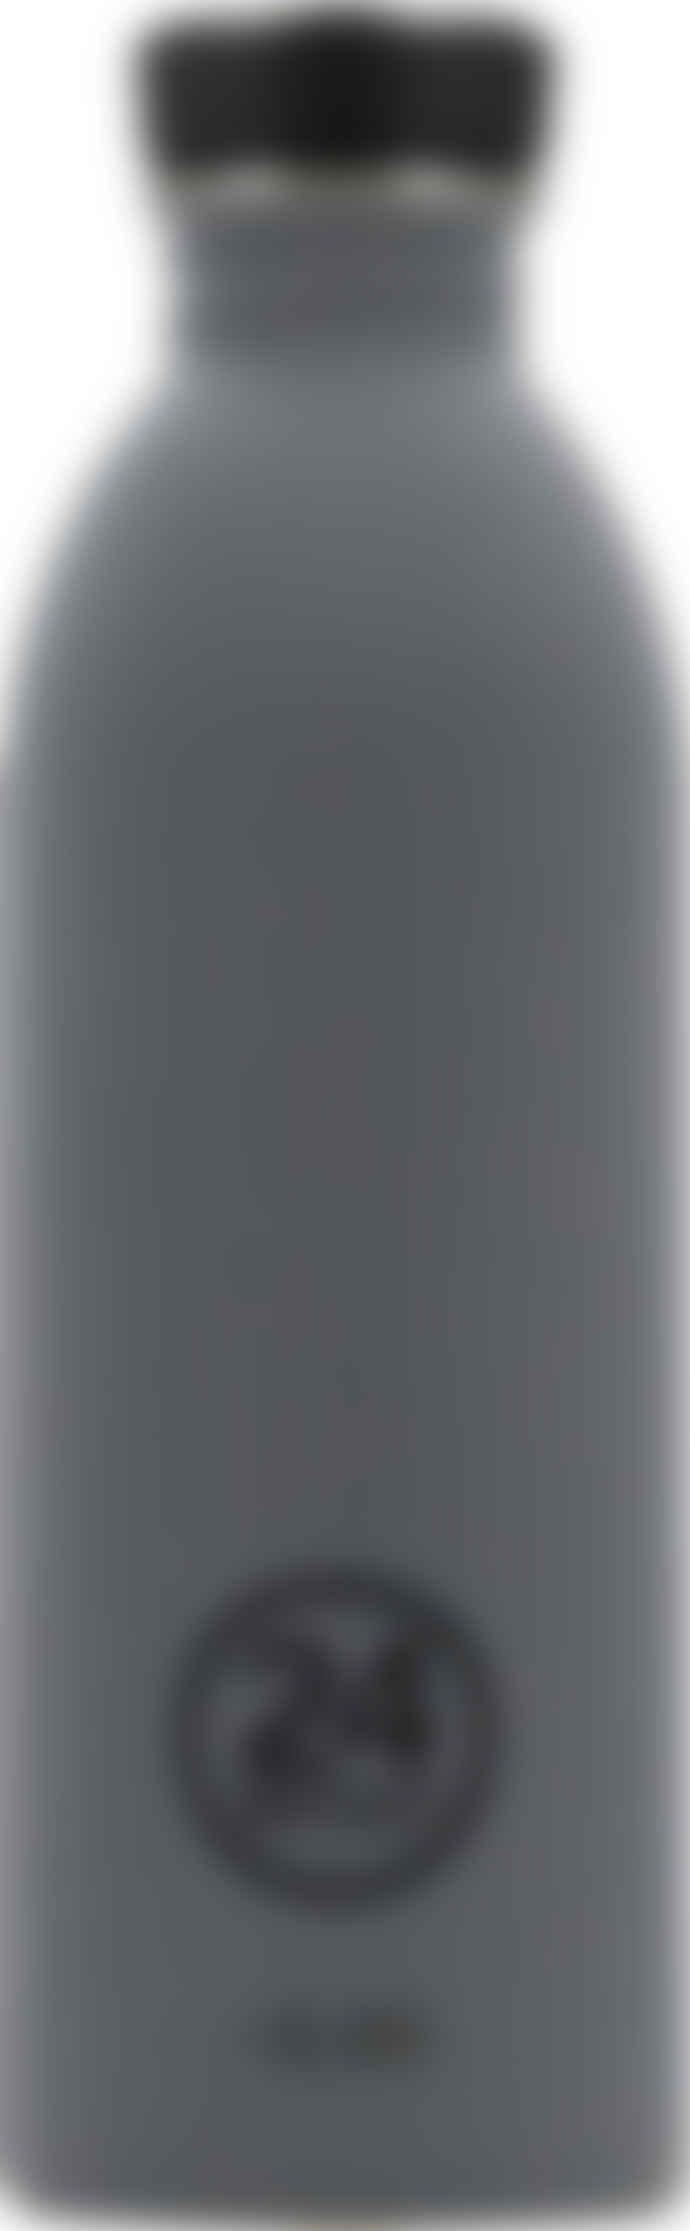 24Bottles 500ml Formal Grey Urban Bottle